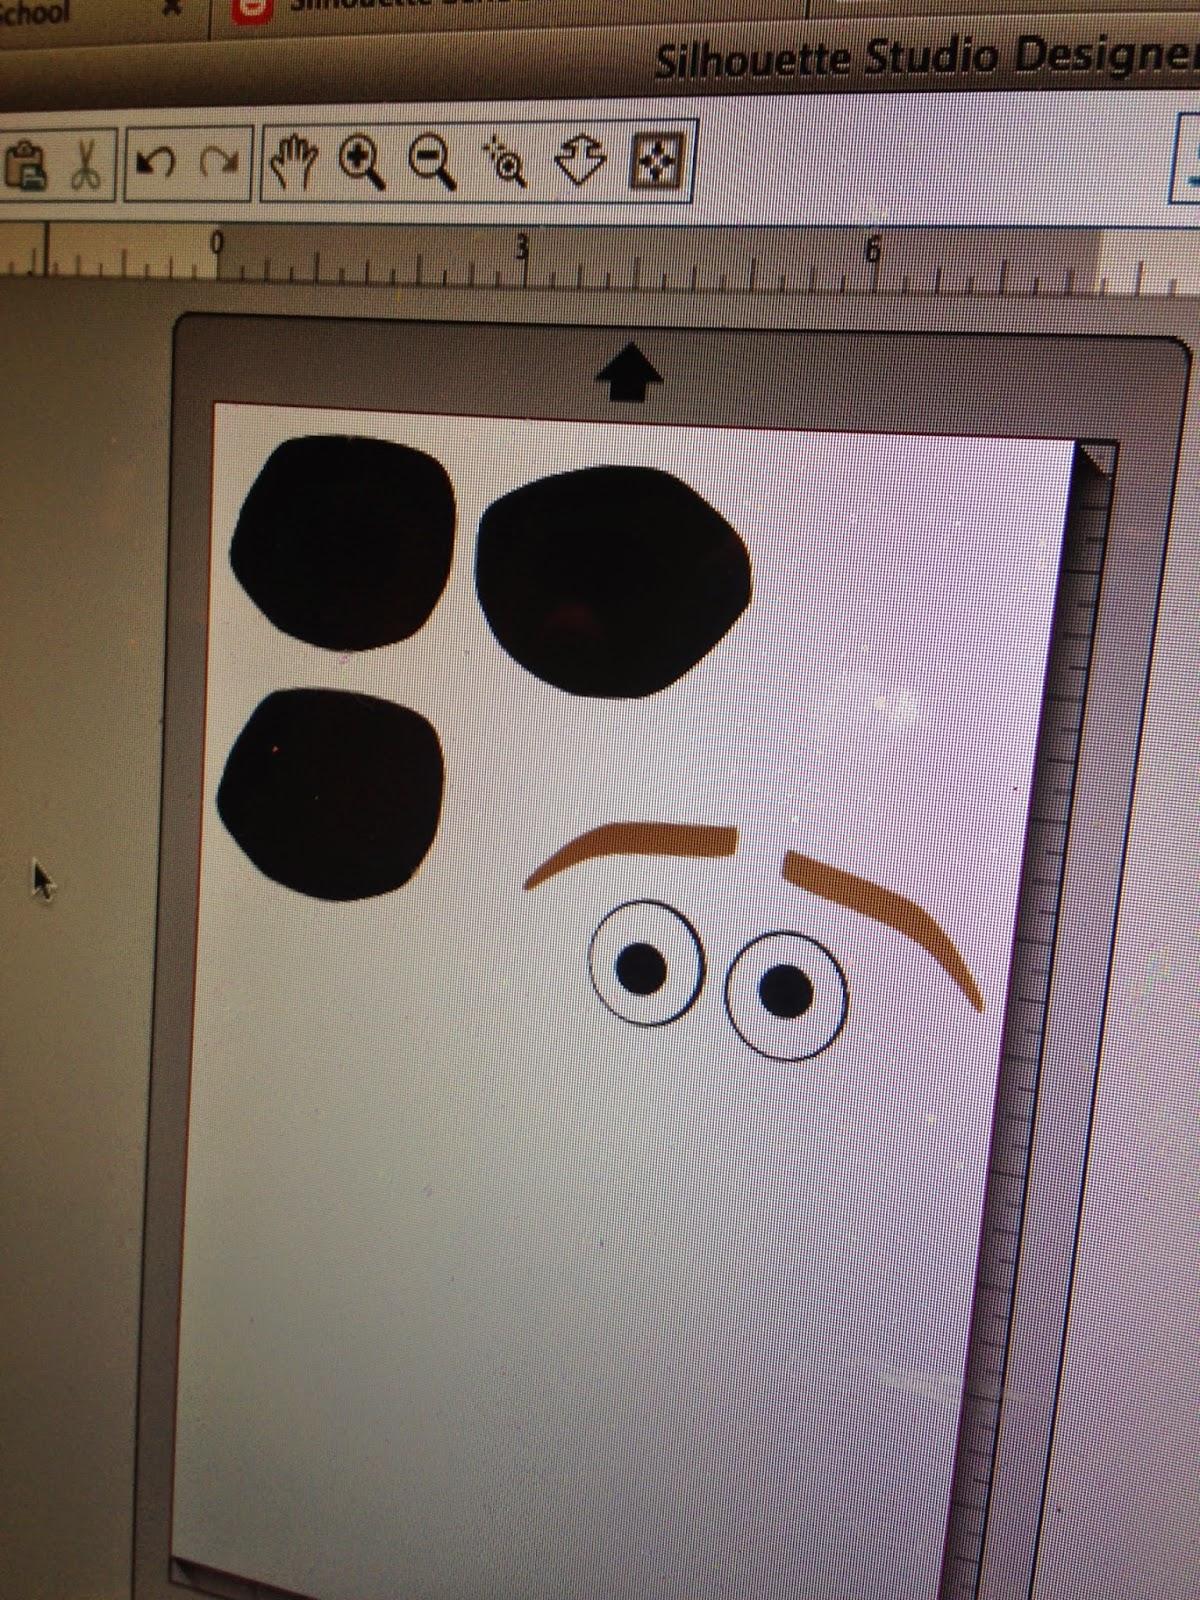 Felt, cut, Silhouette, Silhouette tutorial, Silhouette Studio